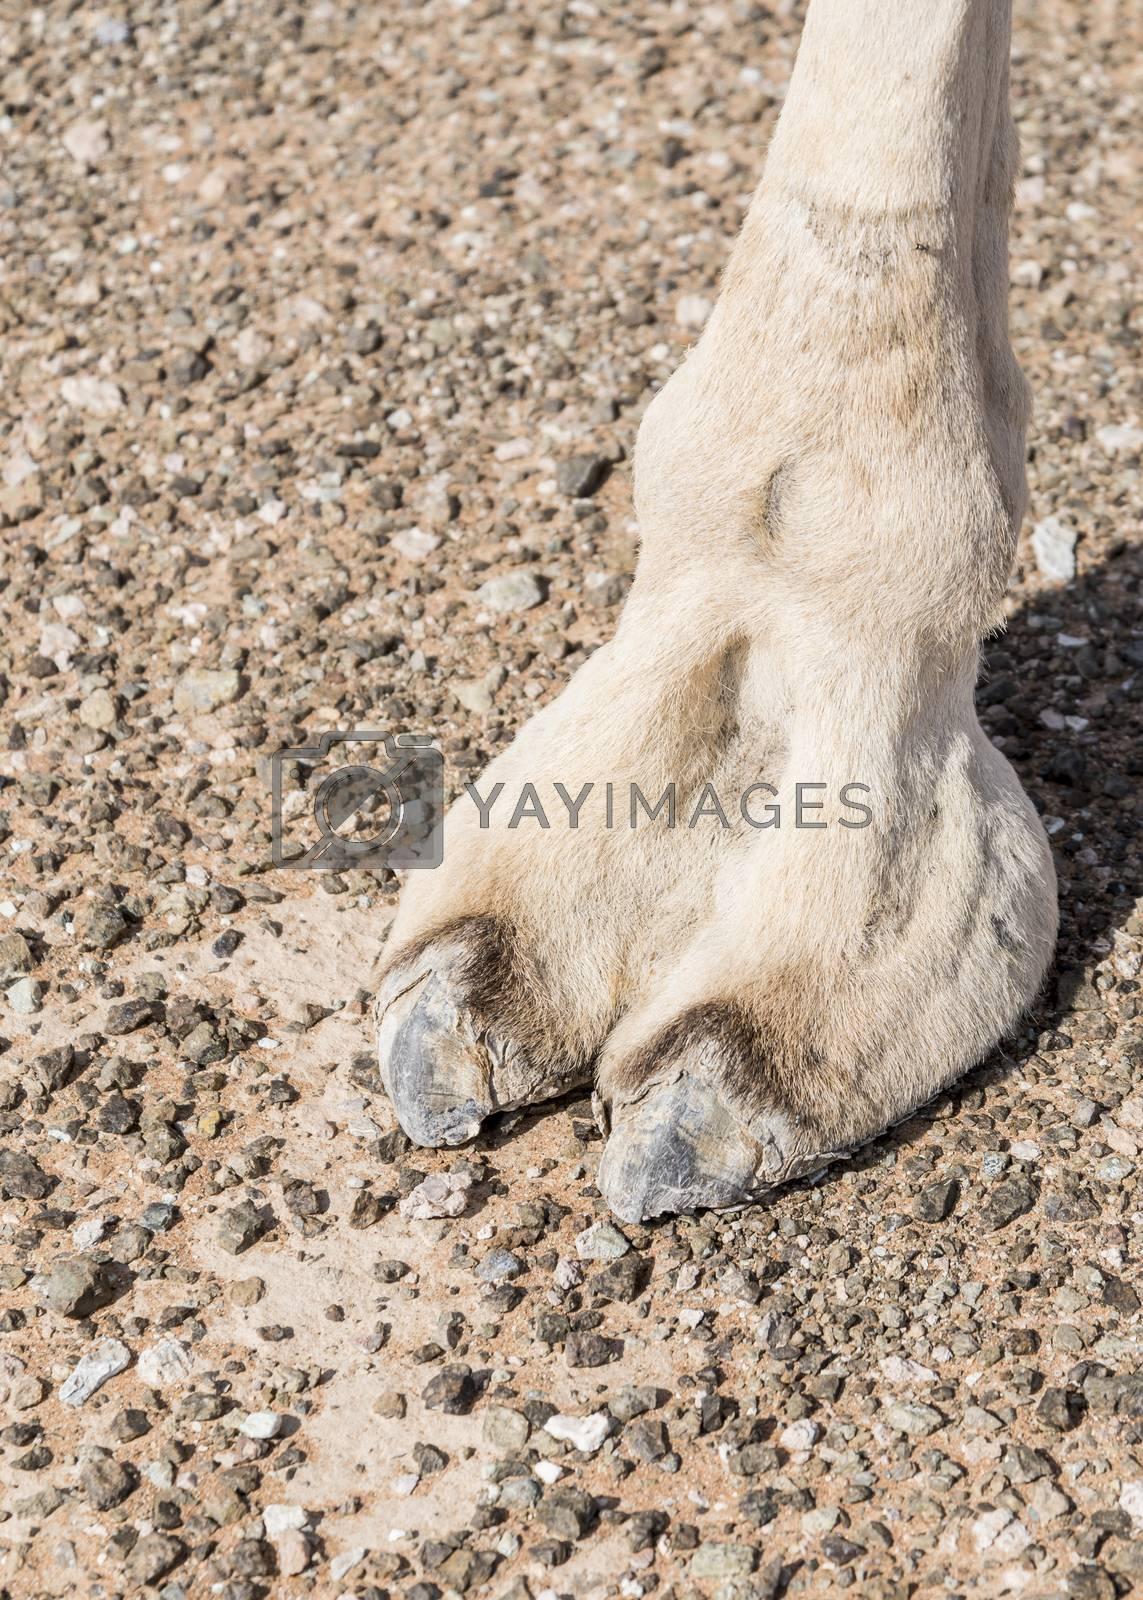 Royalty free image of Camel feet in Sharjah Emirates, UAE by GABIS